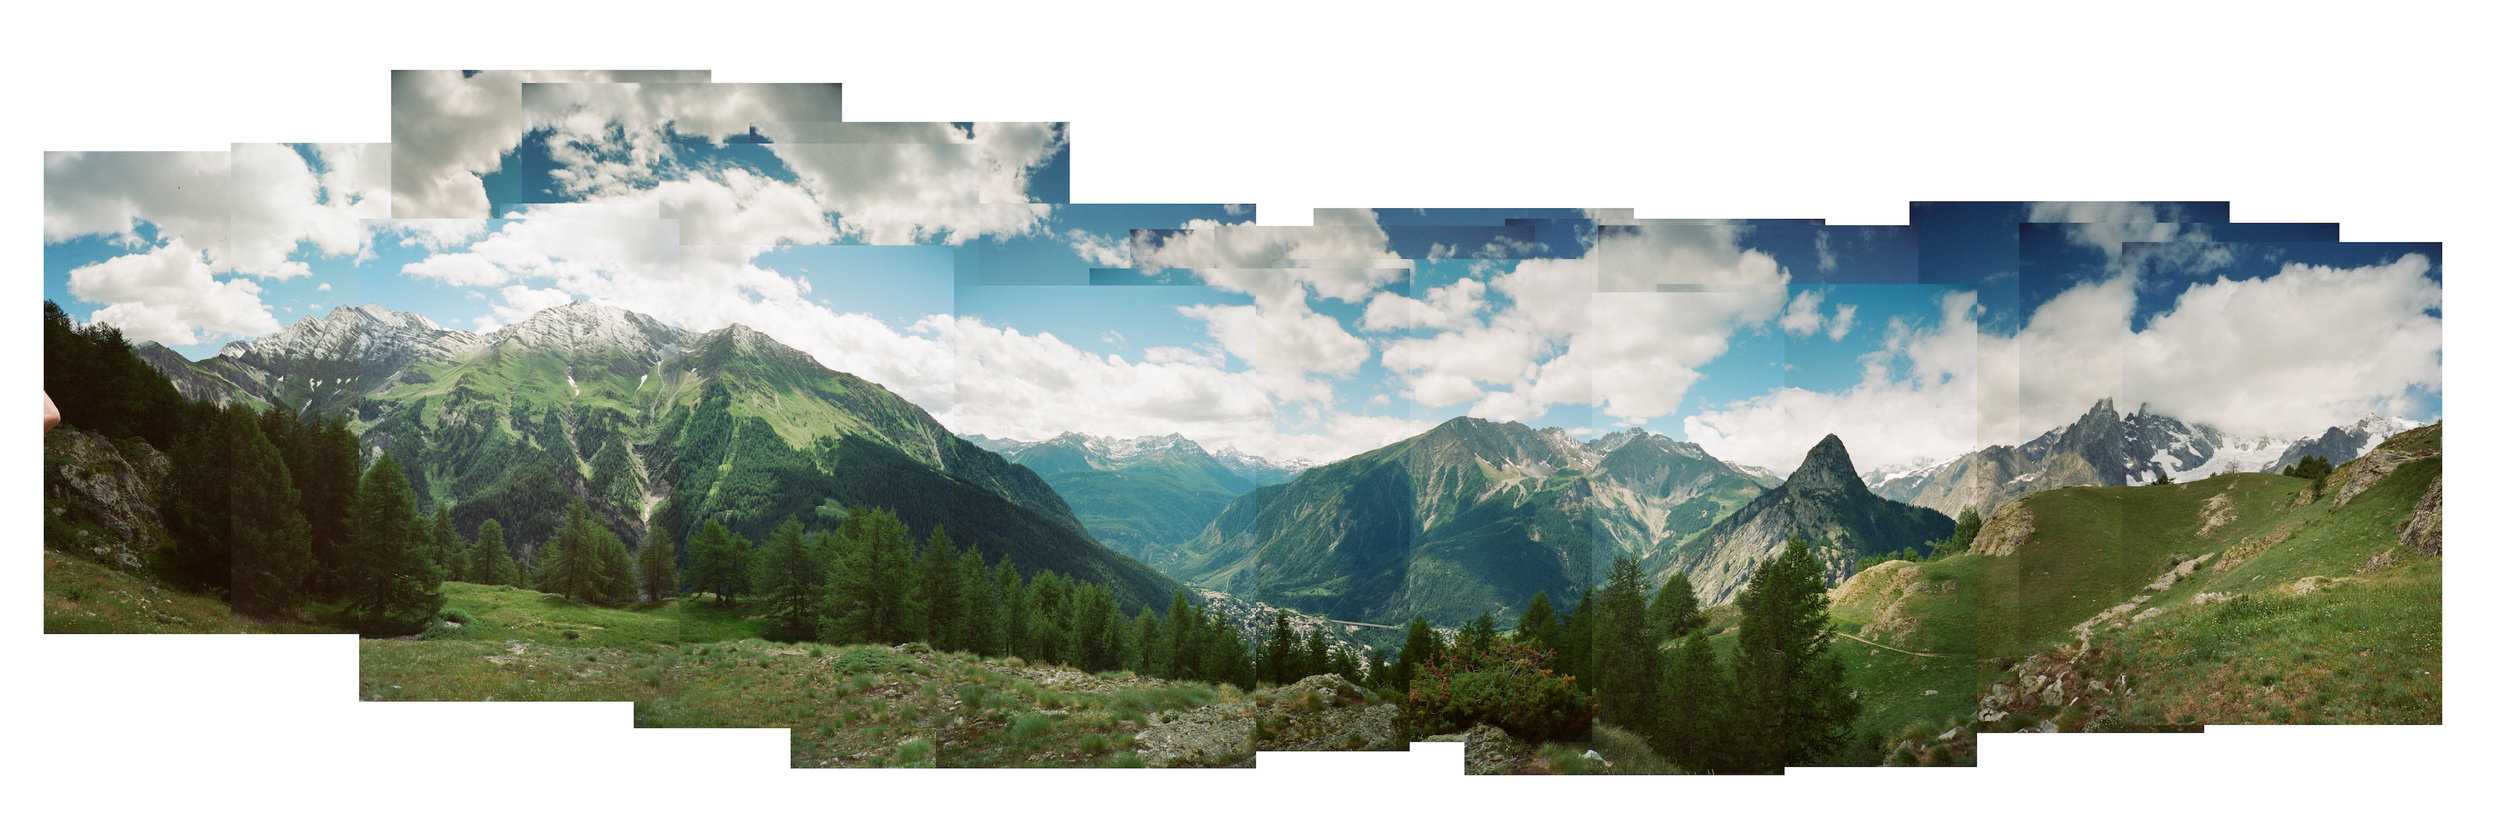 gradient snow mountains.jpg